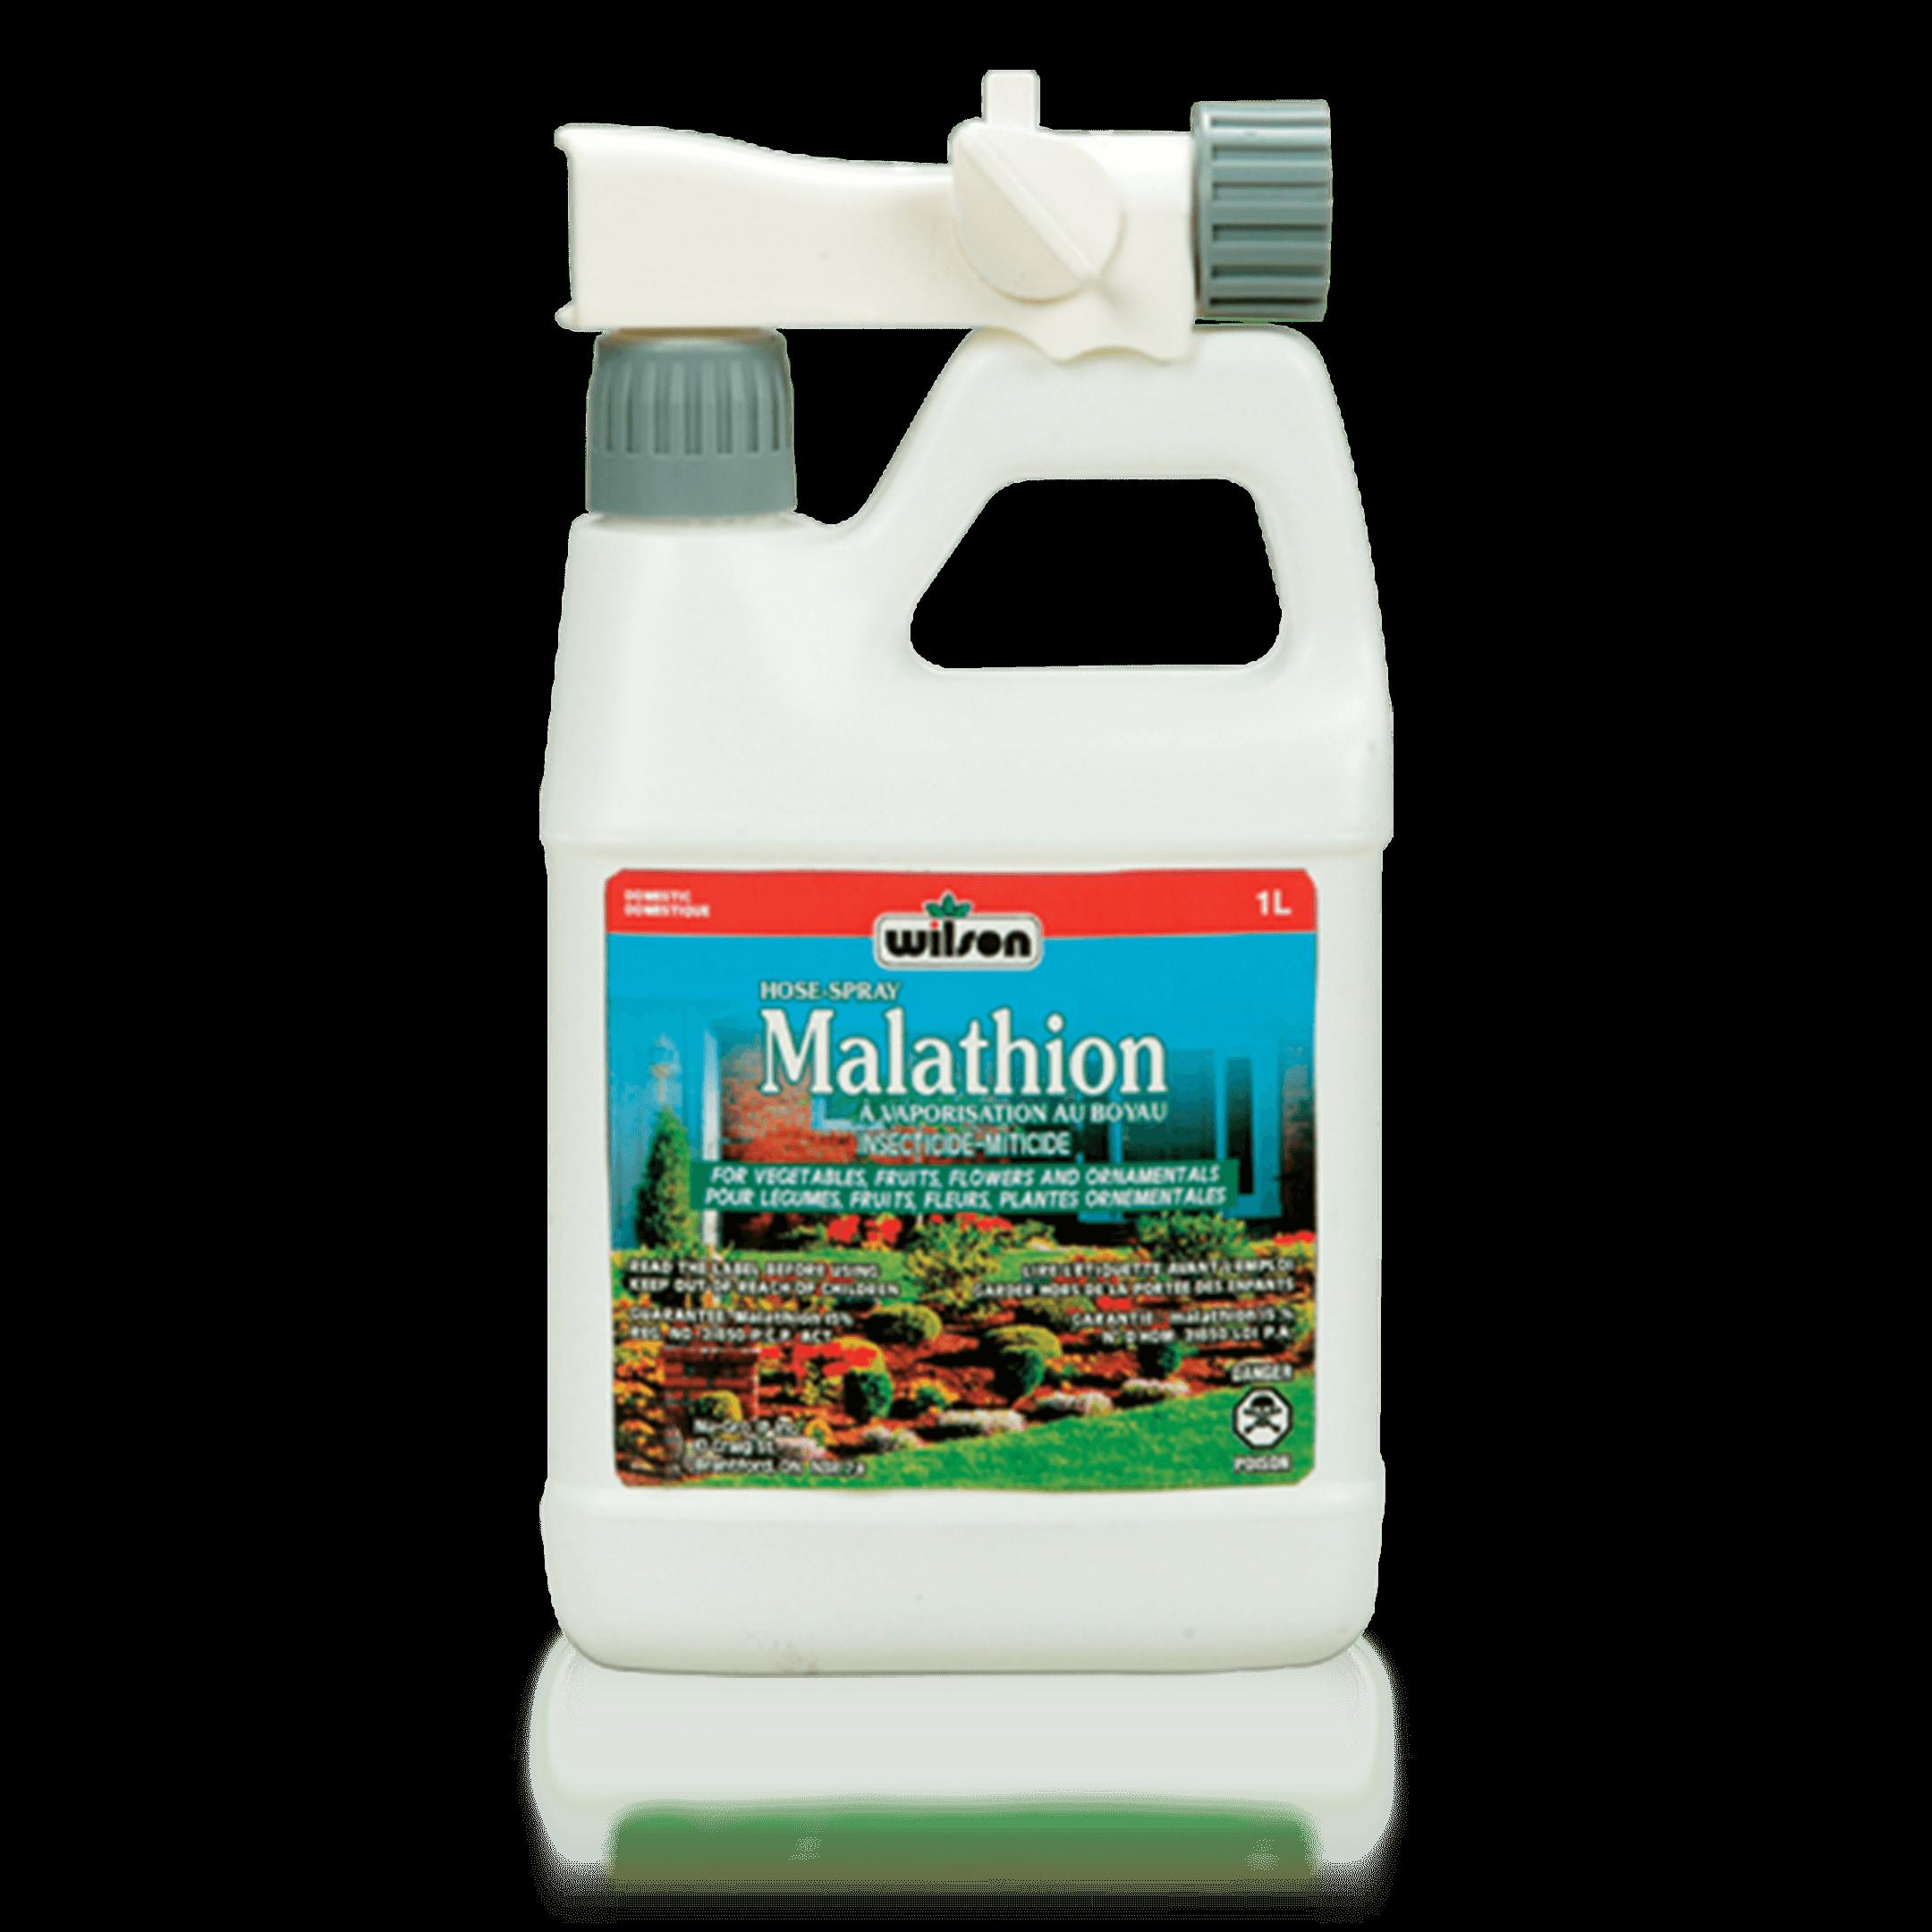 Malathion Insecticide Attach Spray